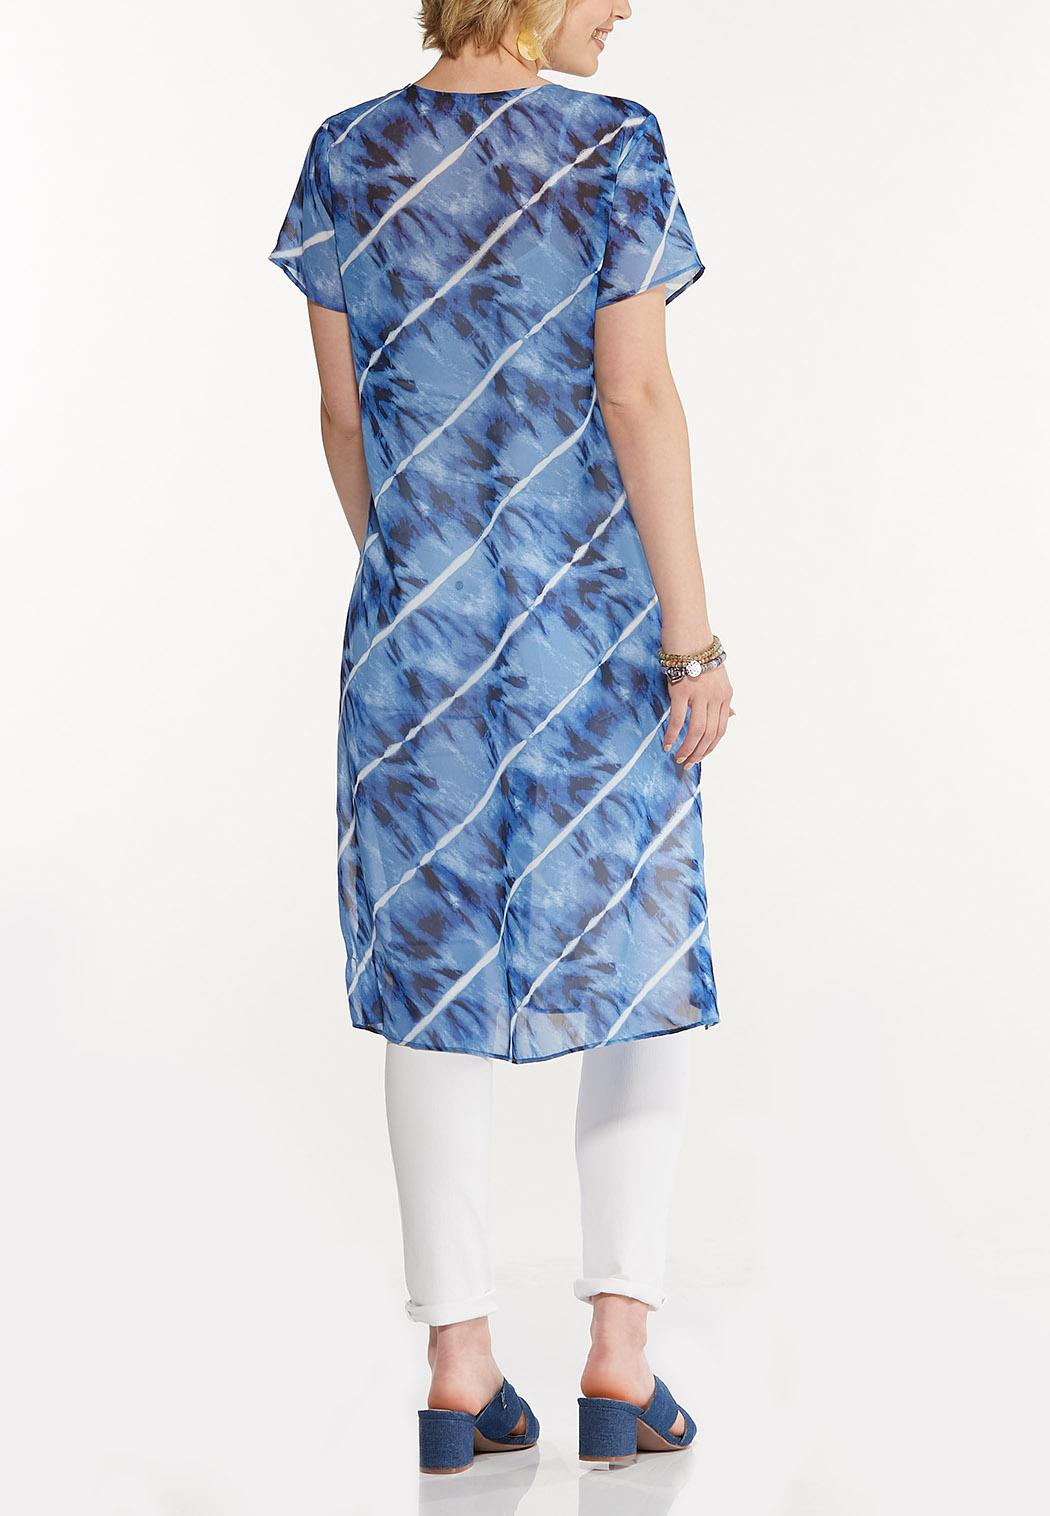 Plus Size Sheer Tie Dye Tunic (Item #44609521)